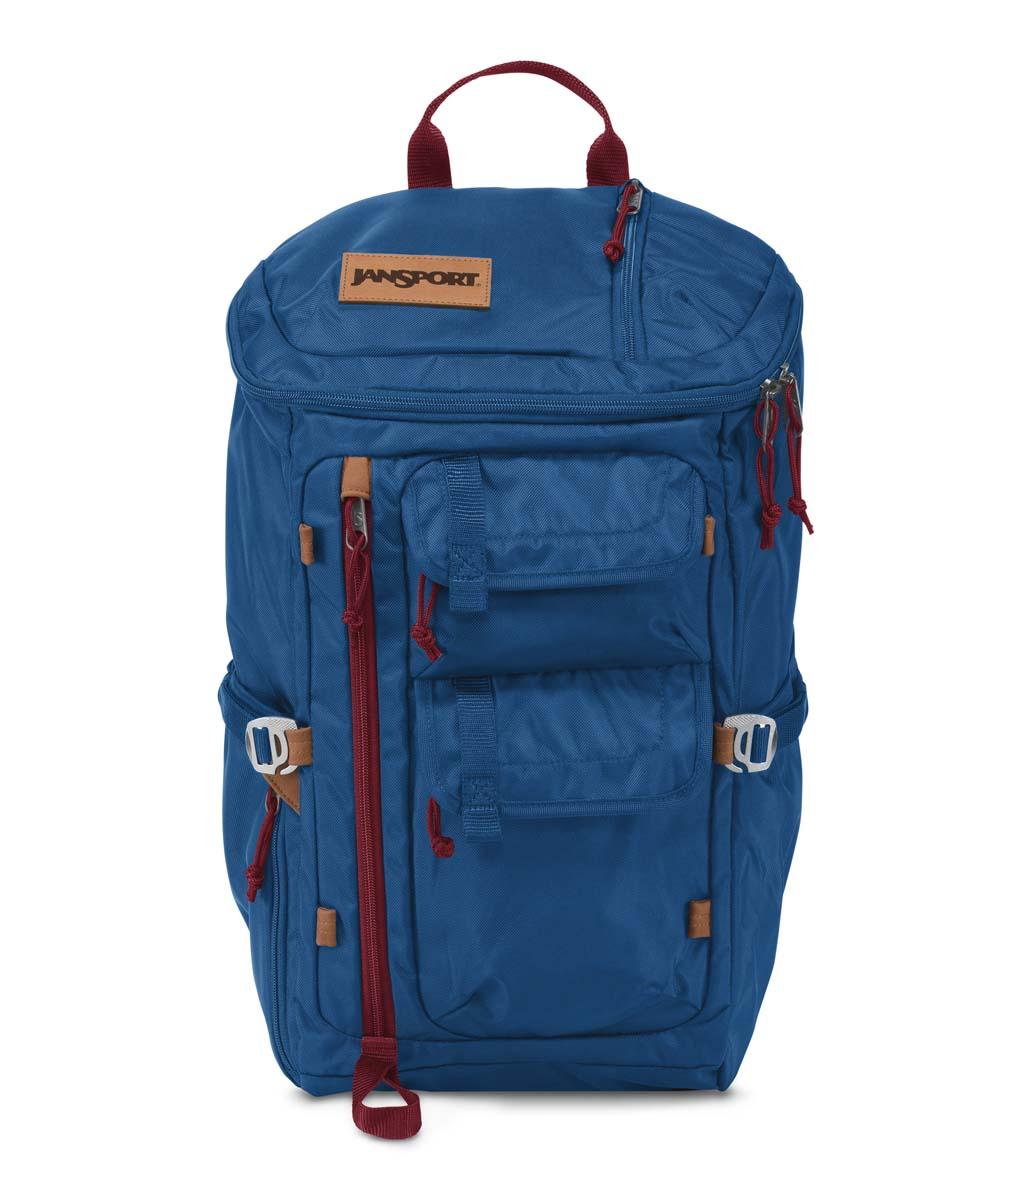 JanSport กระเป๋าเป้ รุ่น Watchtower - Midnight Sky